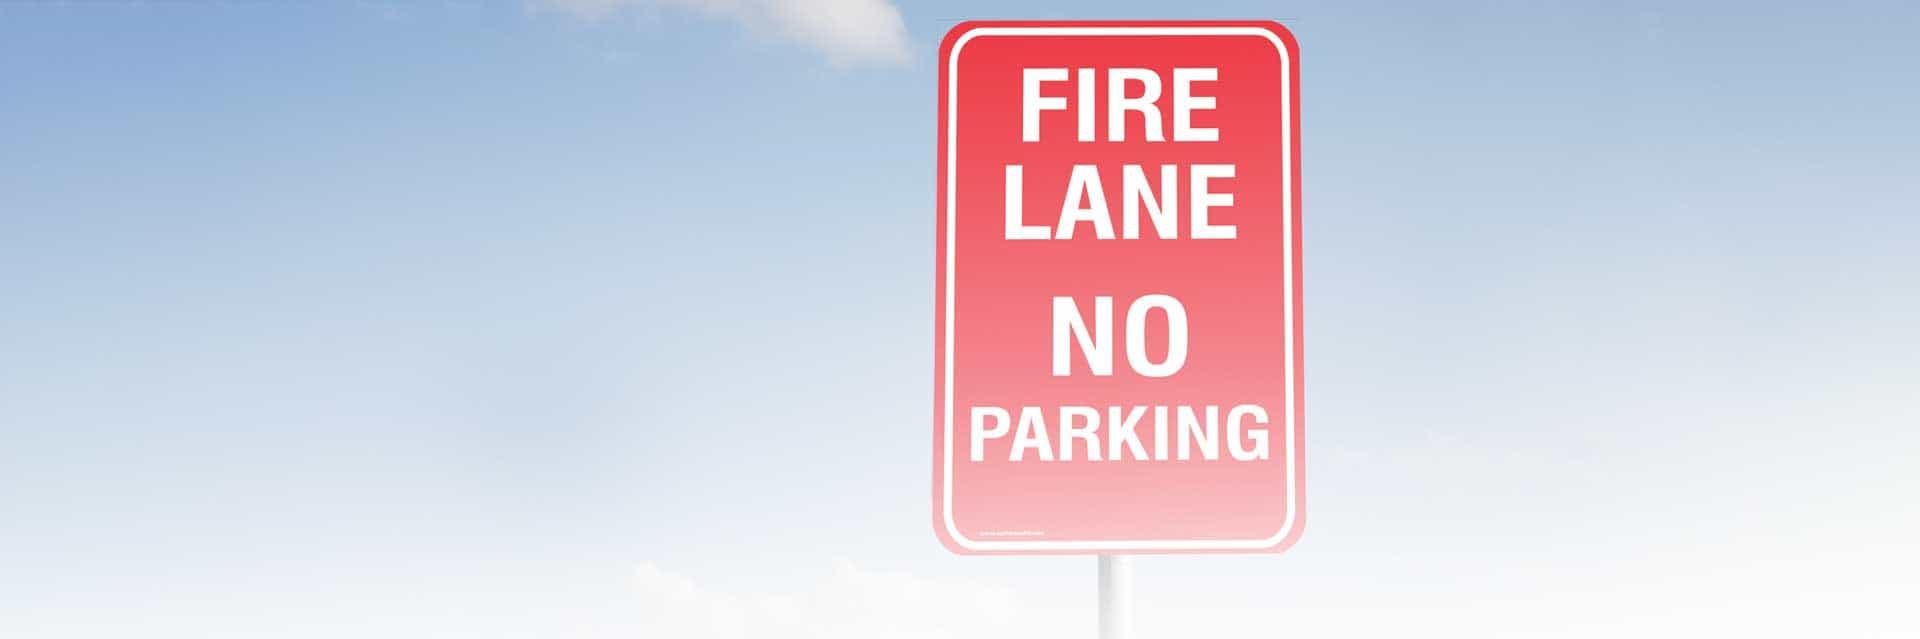 Regulatory Signage Banner Image